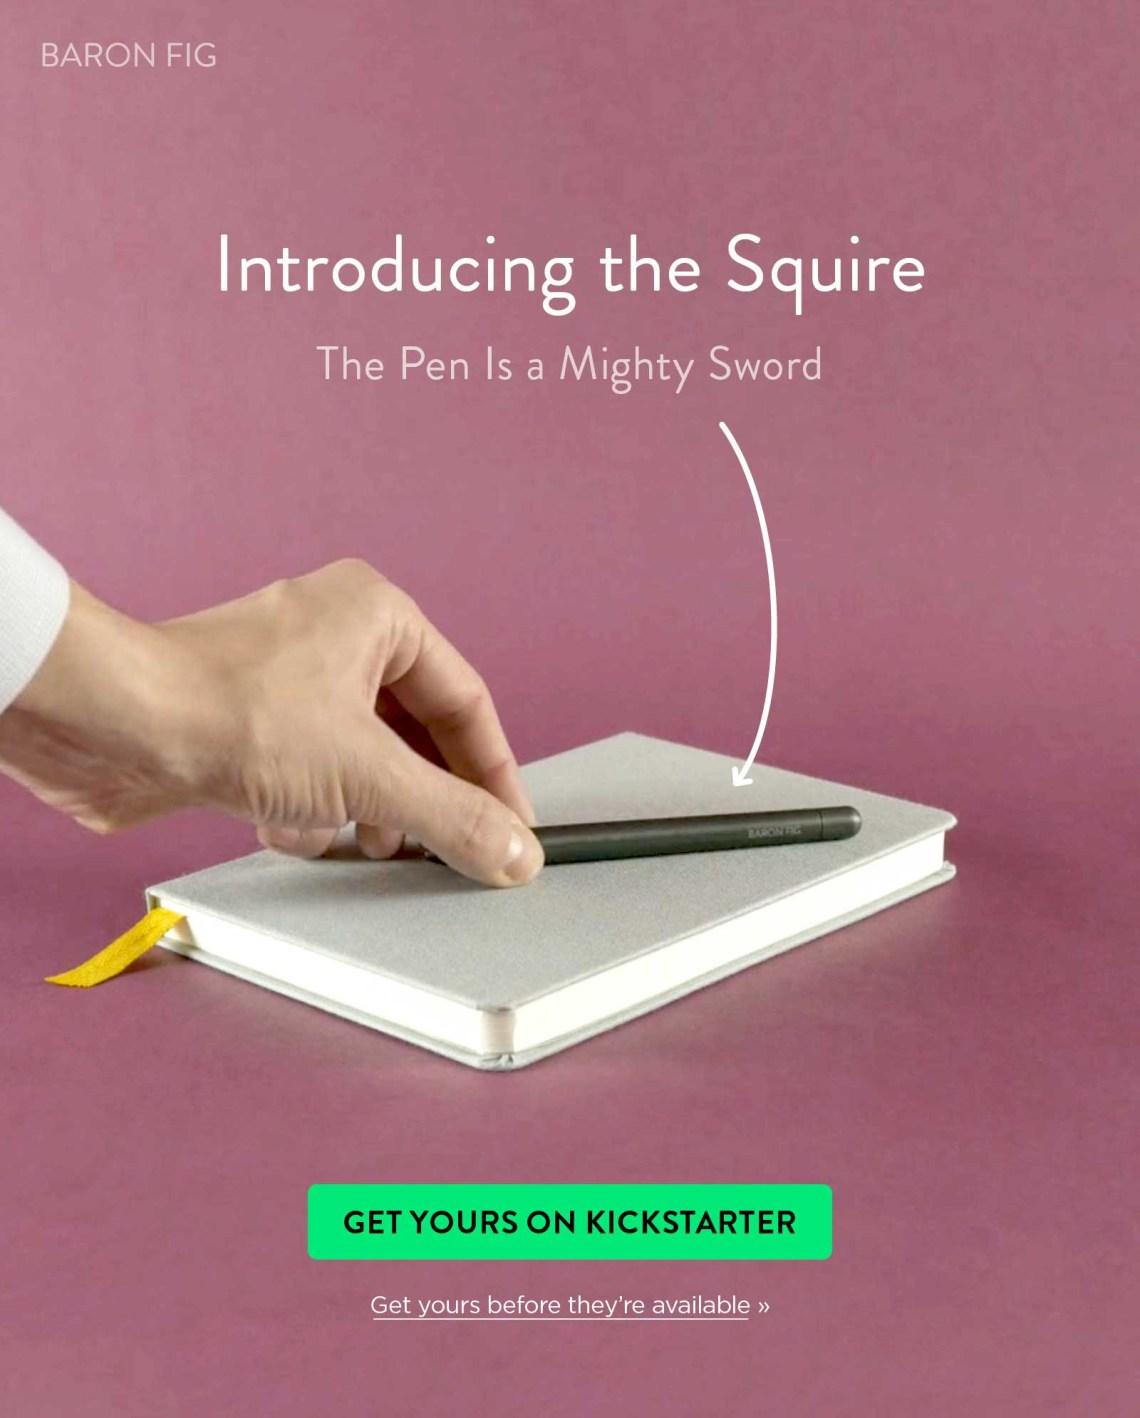 Baron Fig Squire Kickstarter